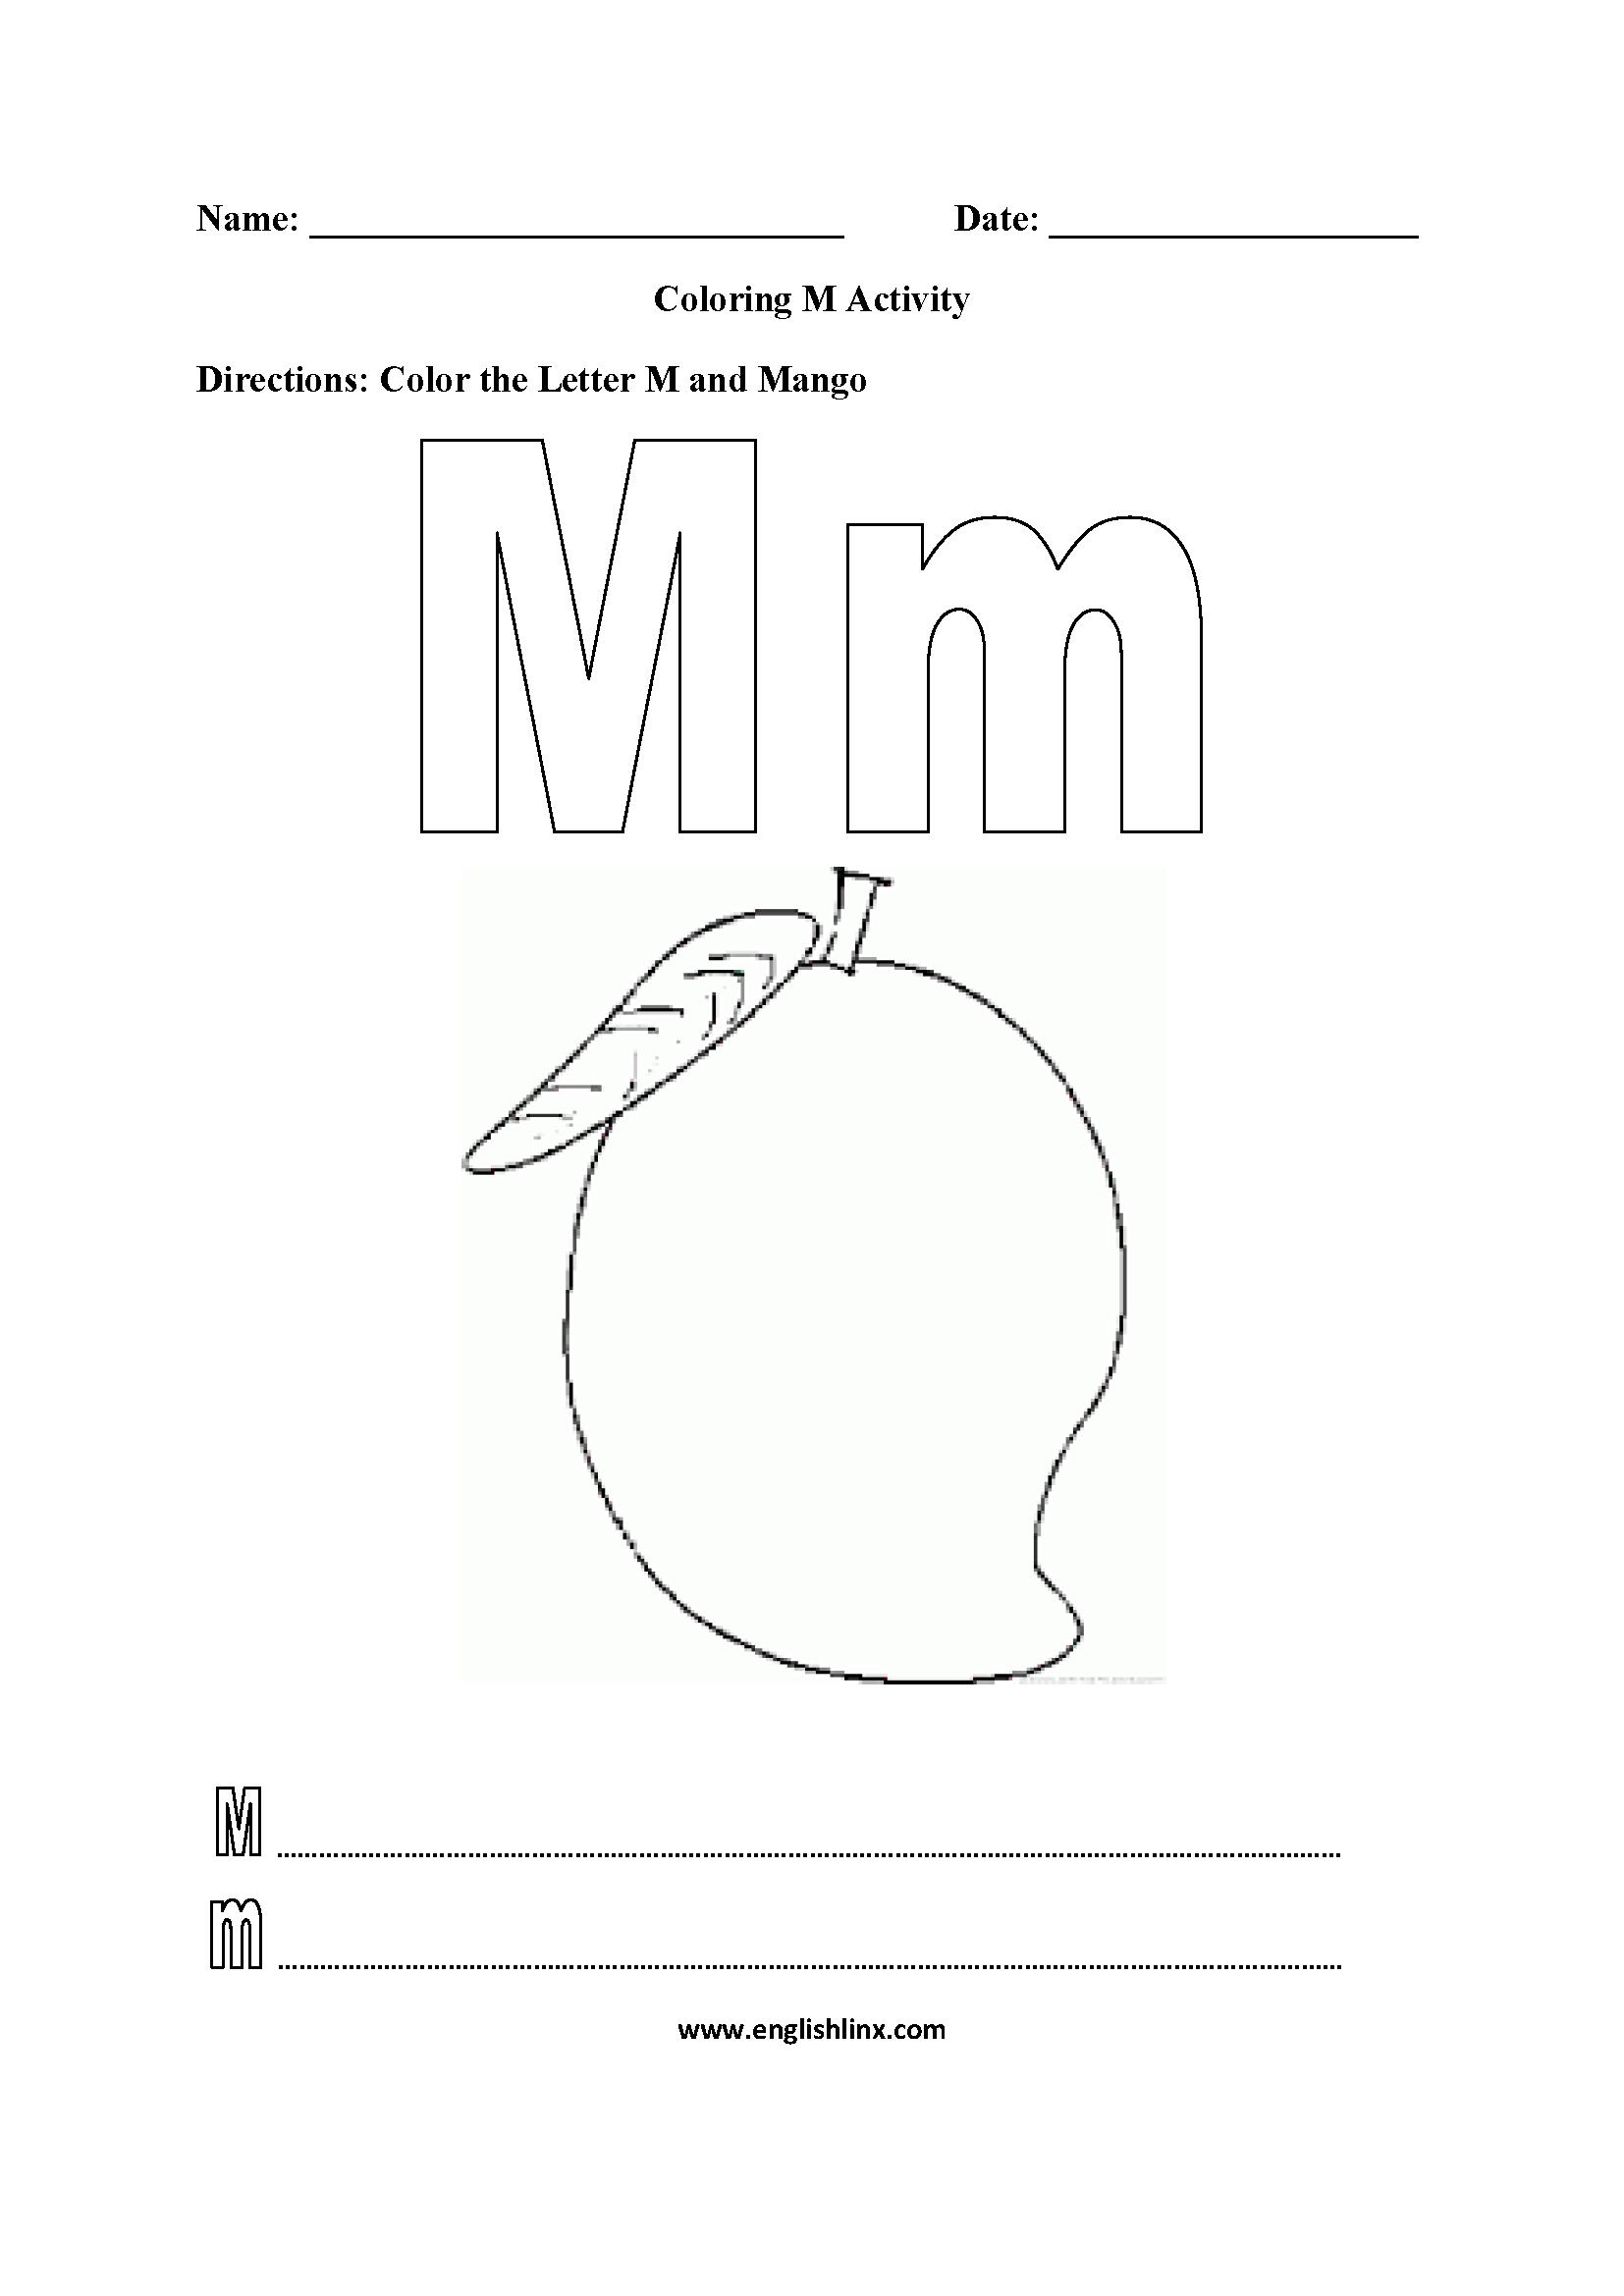 Coloring M Worksheet